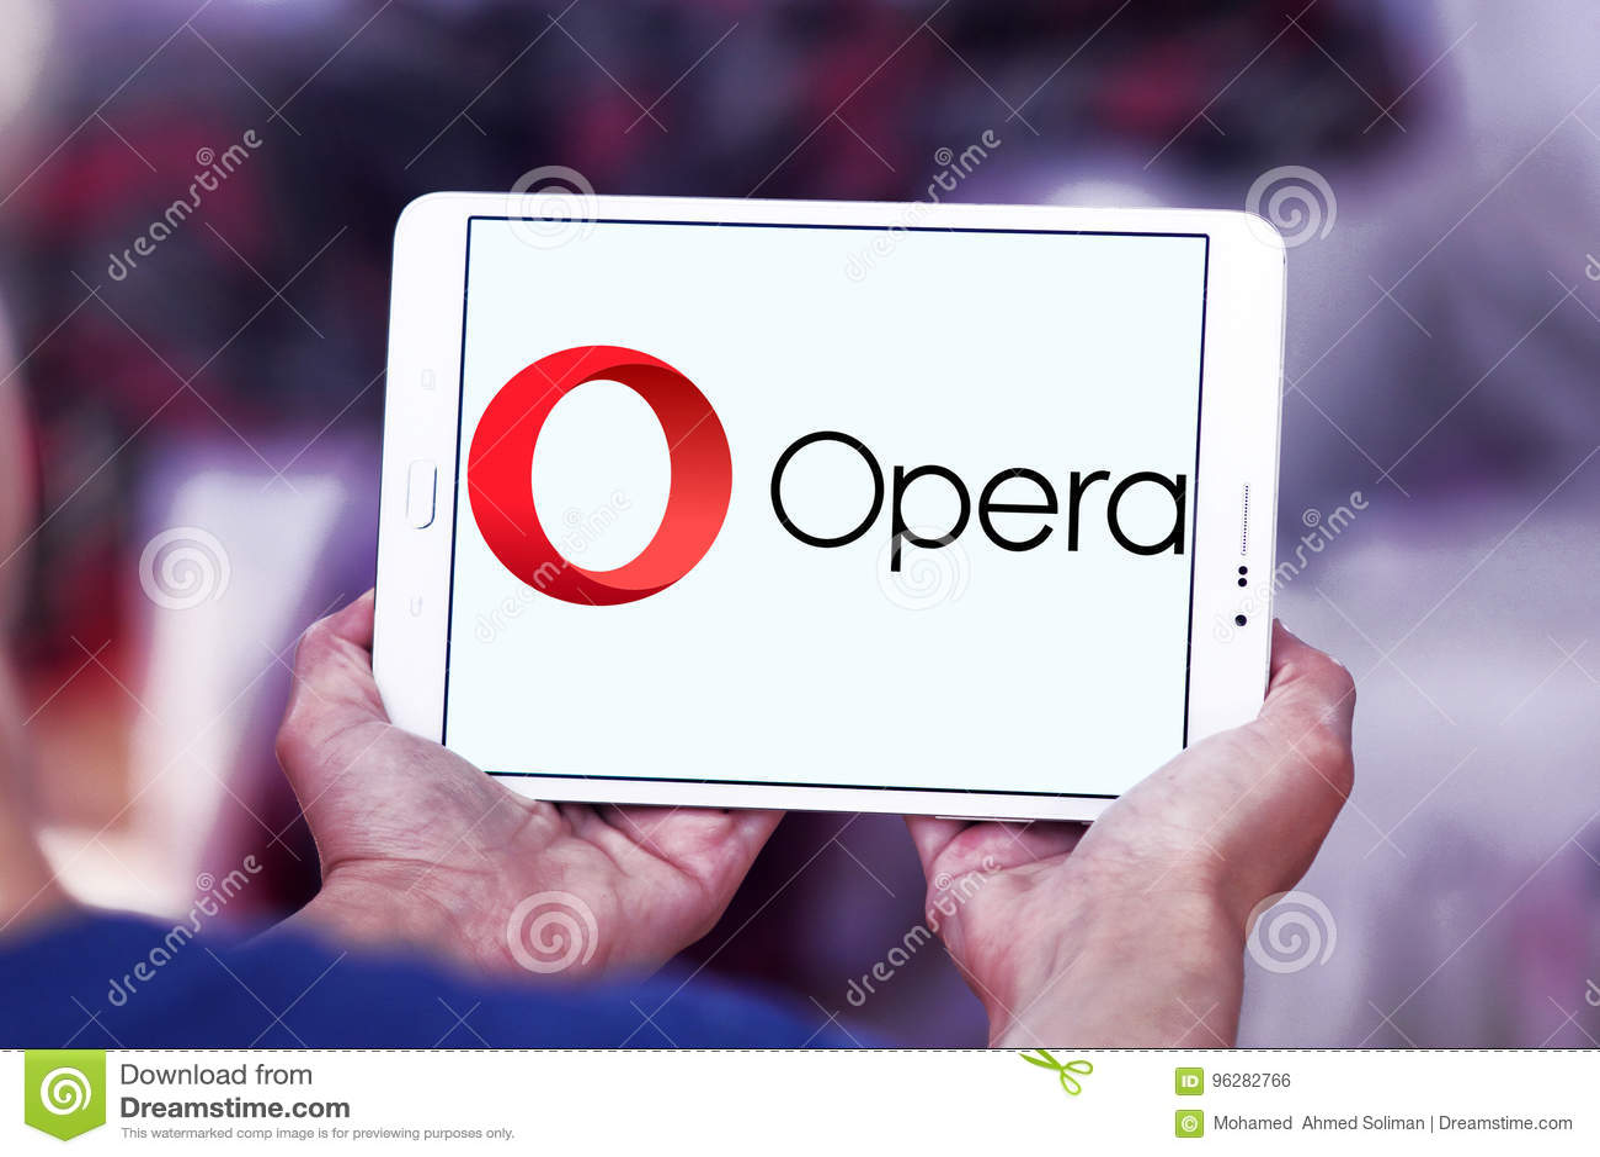 Opera web browser logo